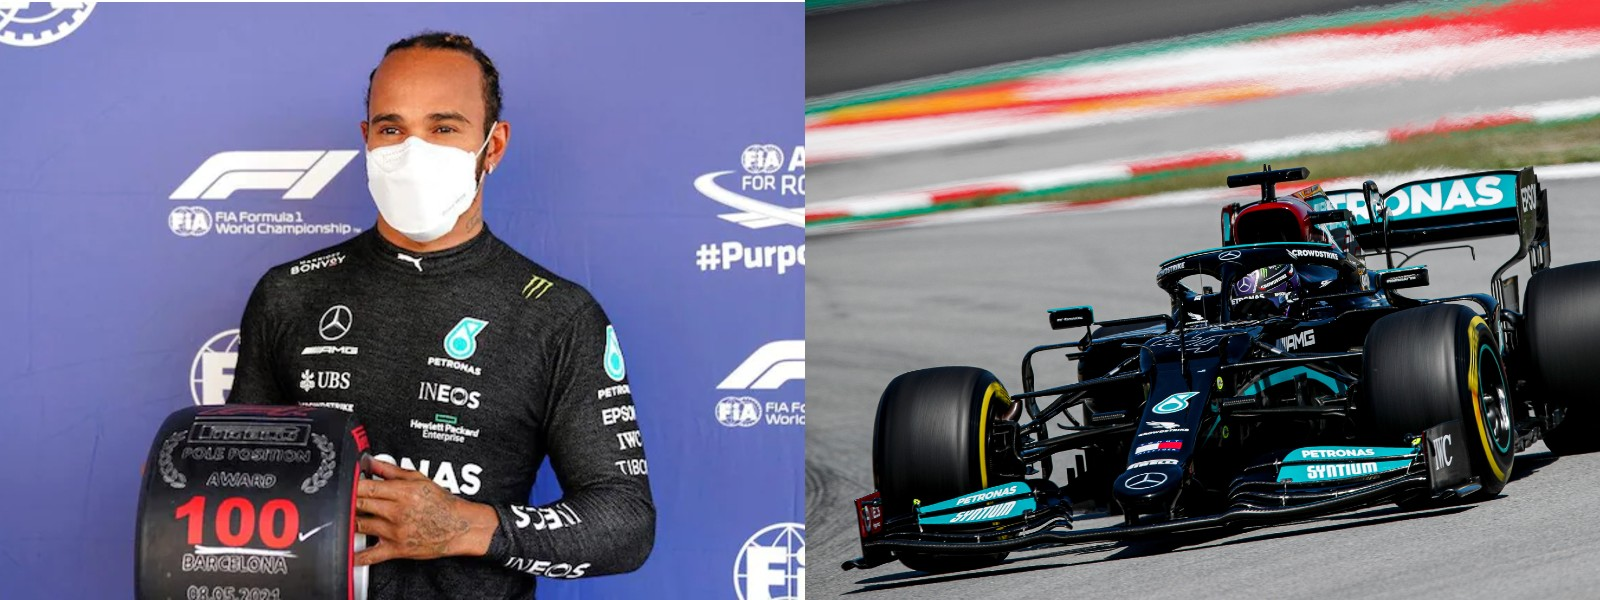 Hamilton beats Verstappen to take 100th career pole in Spain